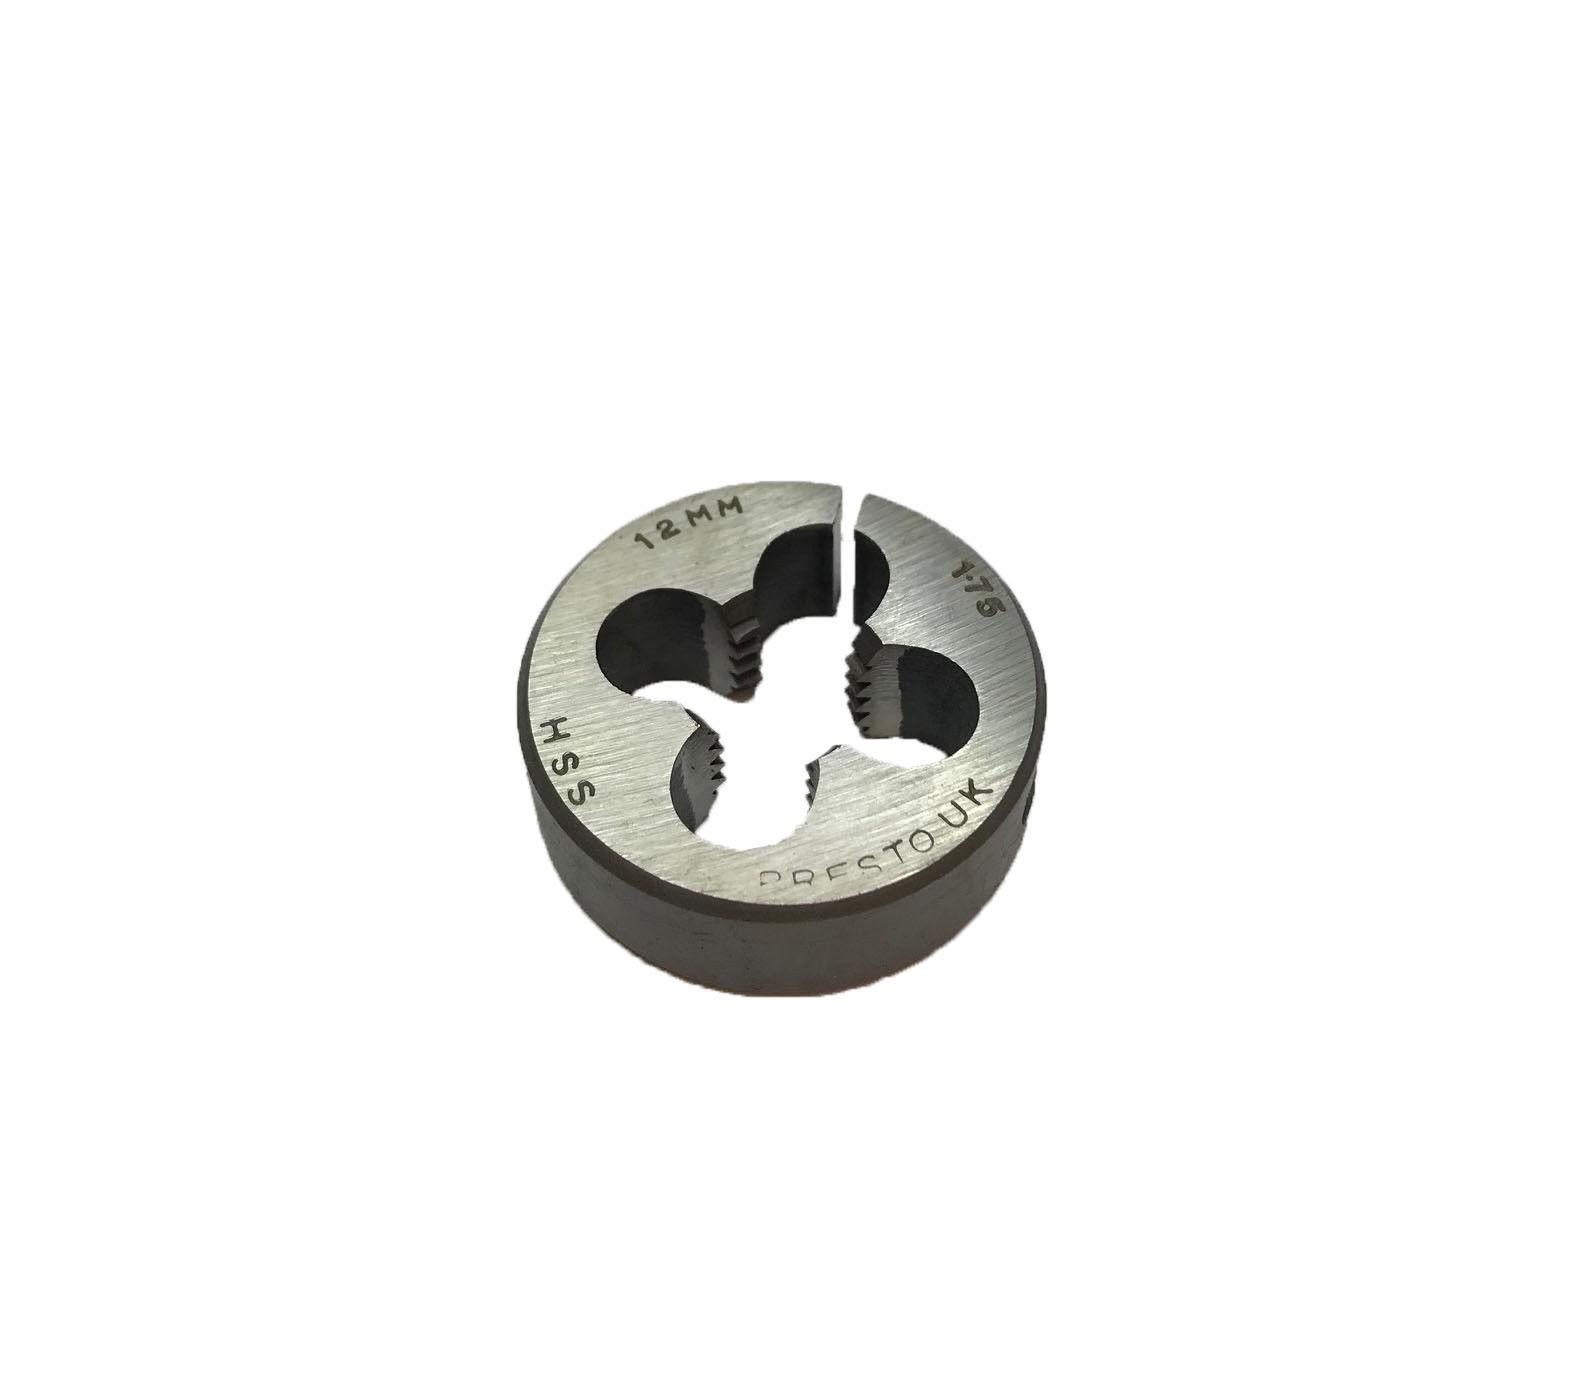 New Presto UK HSS Split Die M10 x 1.5 Circular Threading Die Metric 10mm  Myford